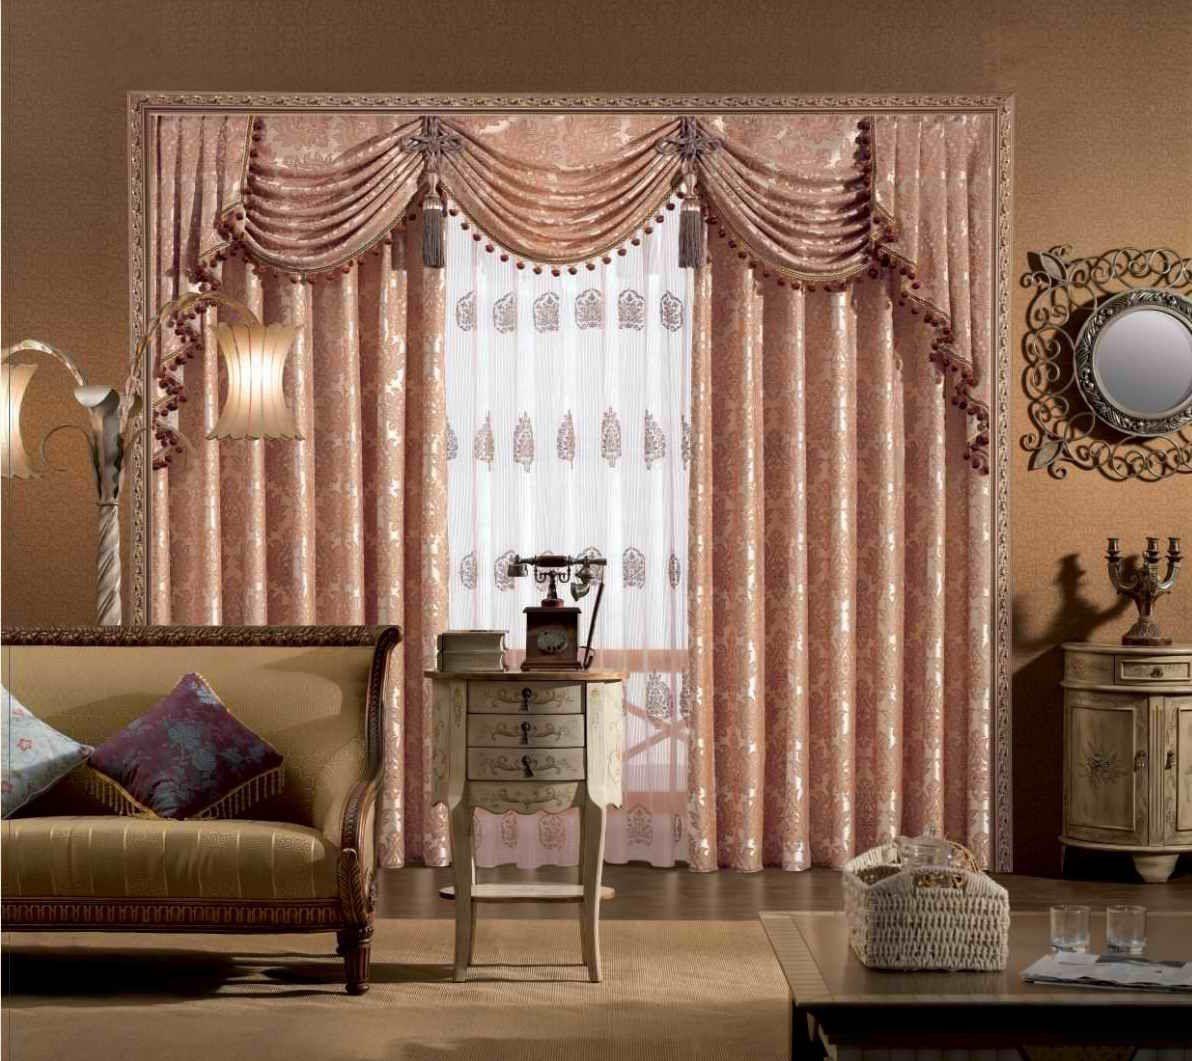 gardinen waschen tipps pauwnieuws. Black Bedroom Furniture Sets. Home Design Ideas